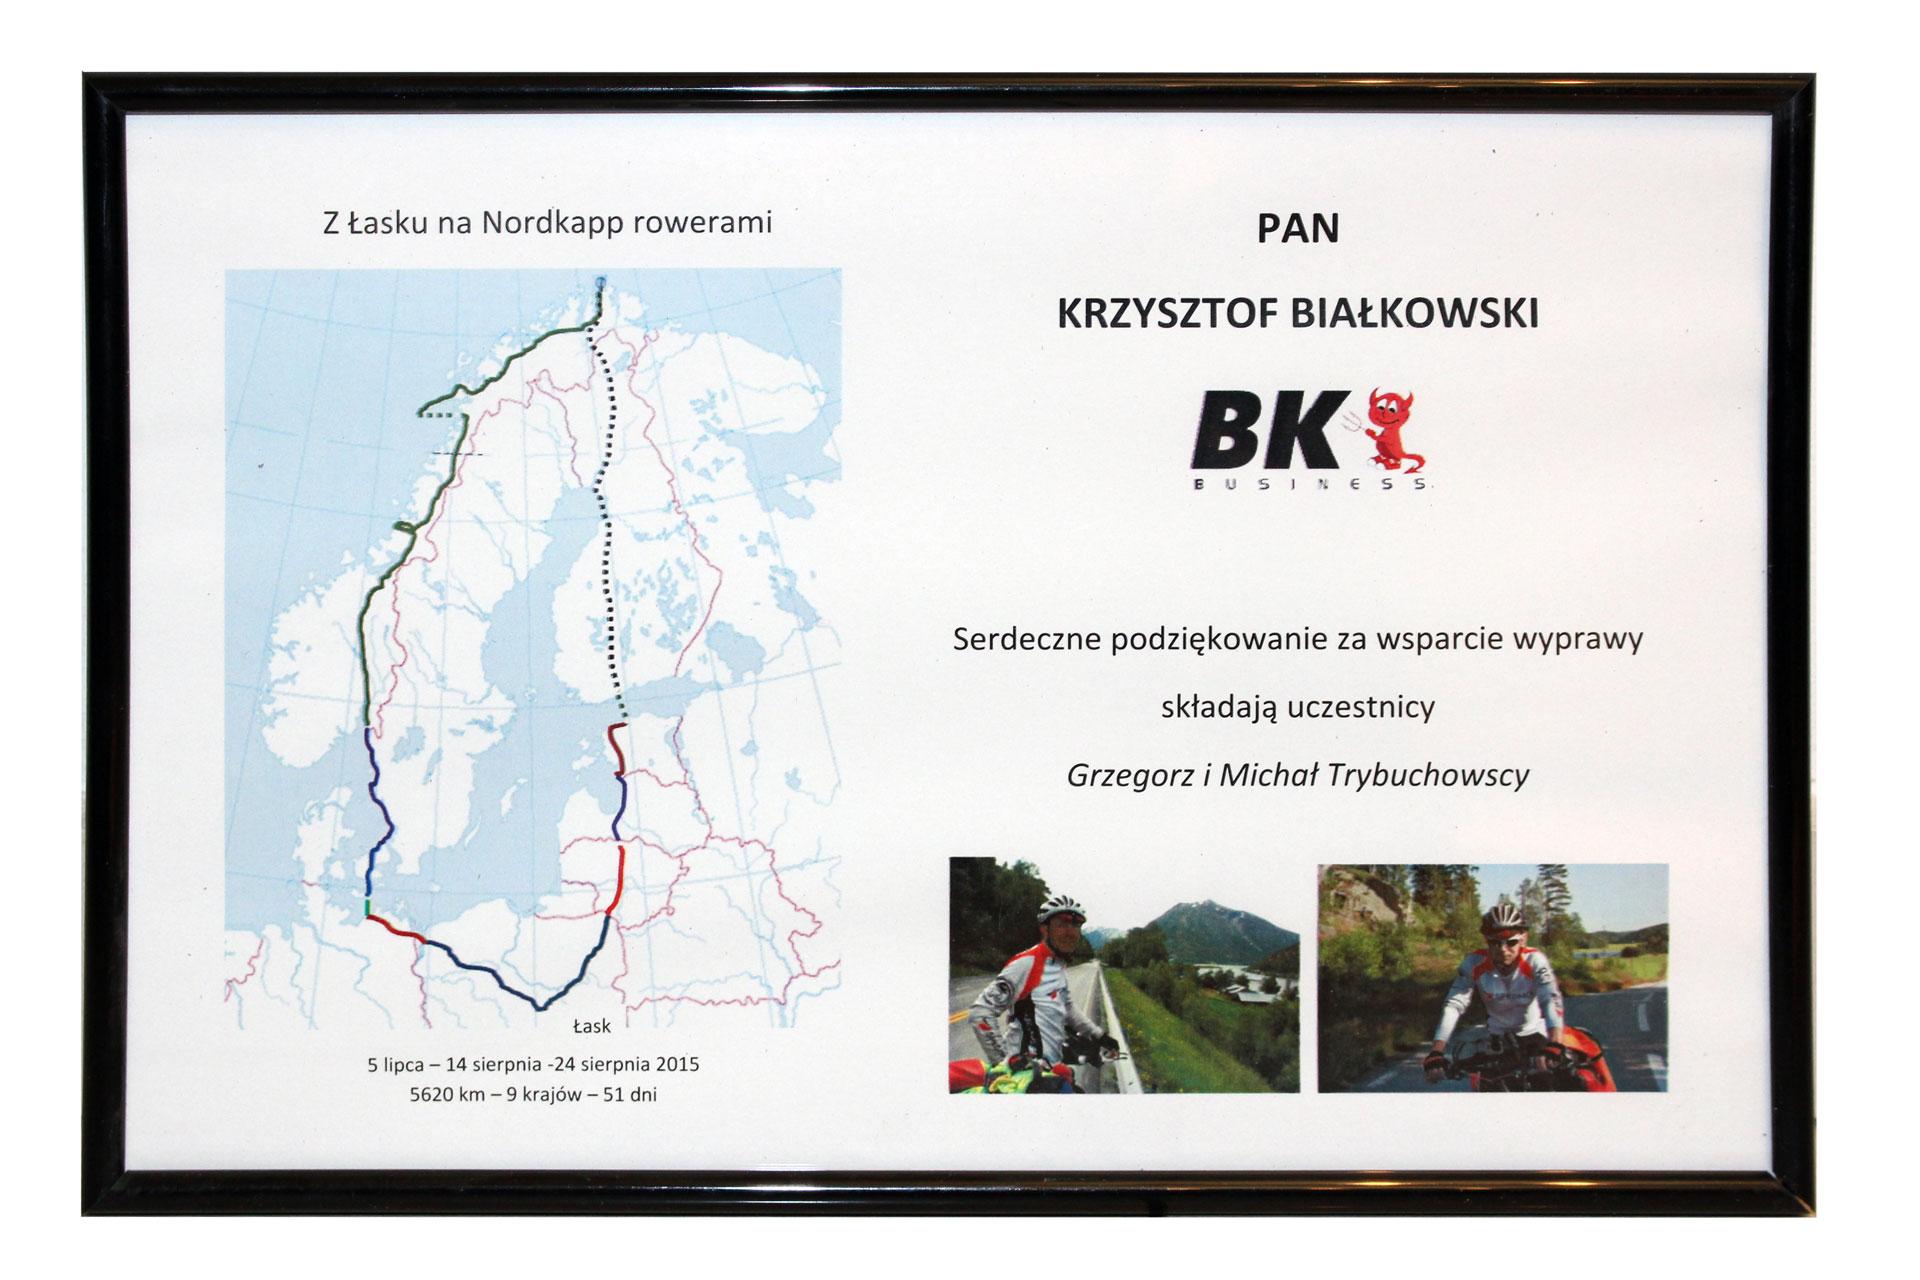 Z Łasku do Nordkapp rowerami